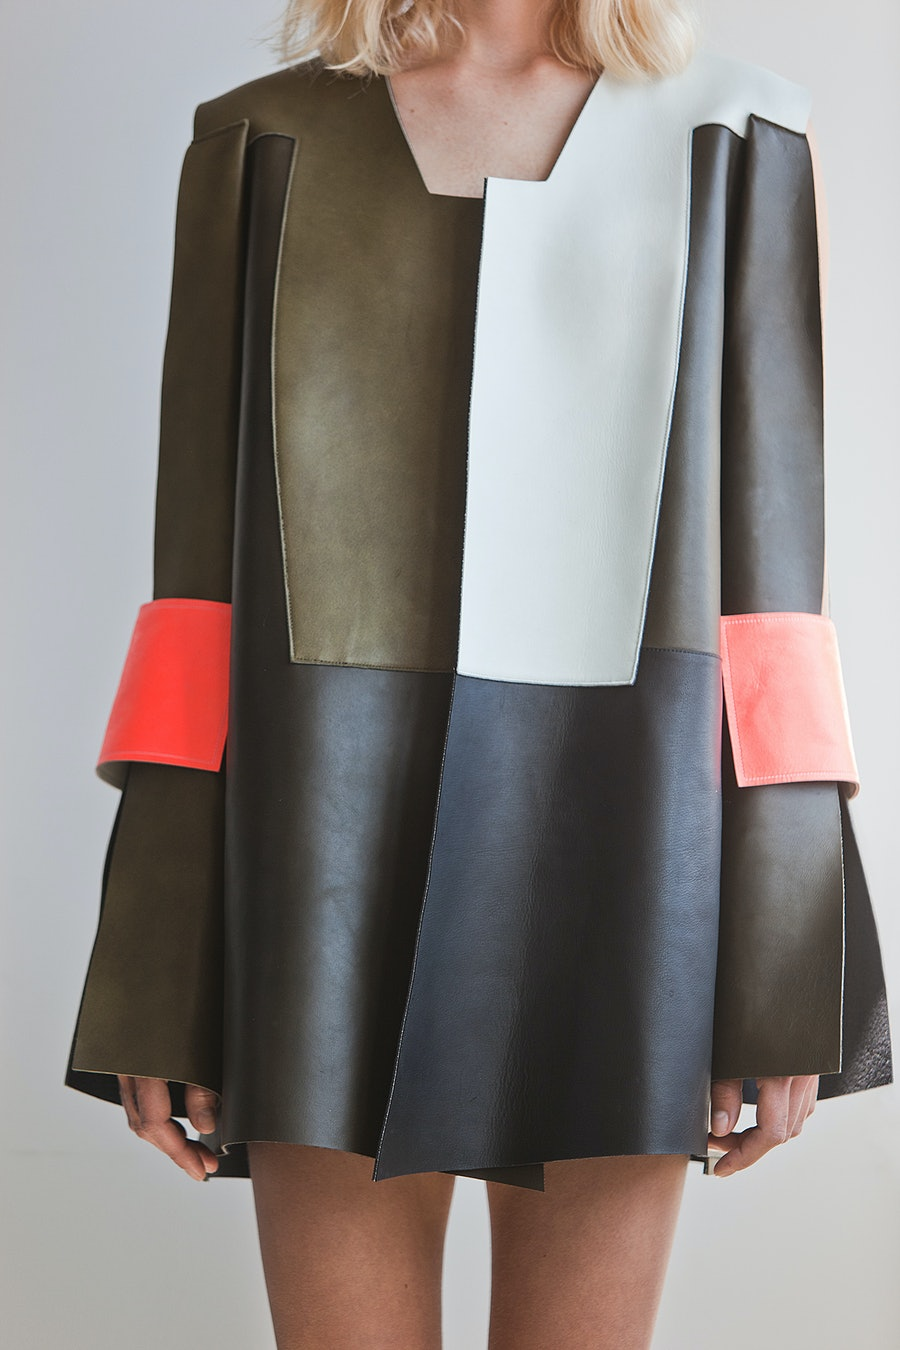 finnish-fashion-9